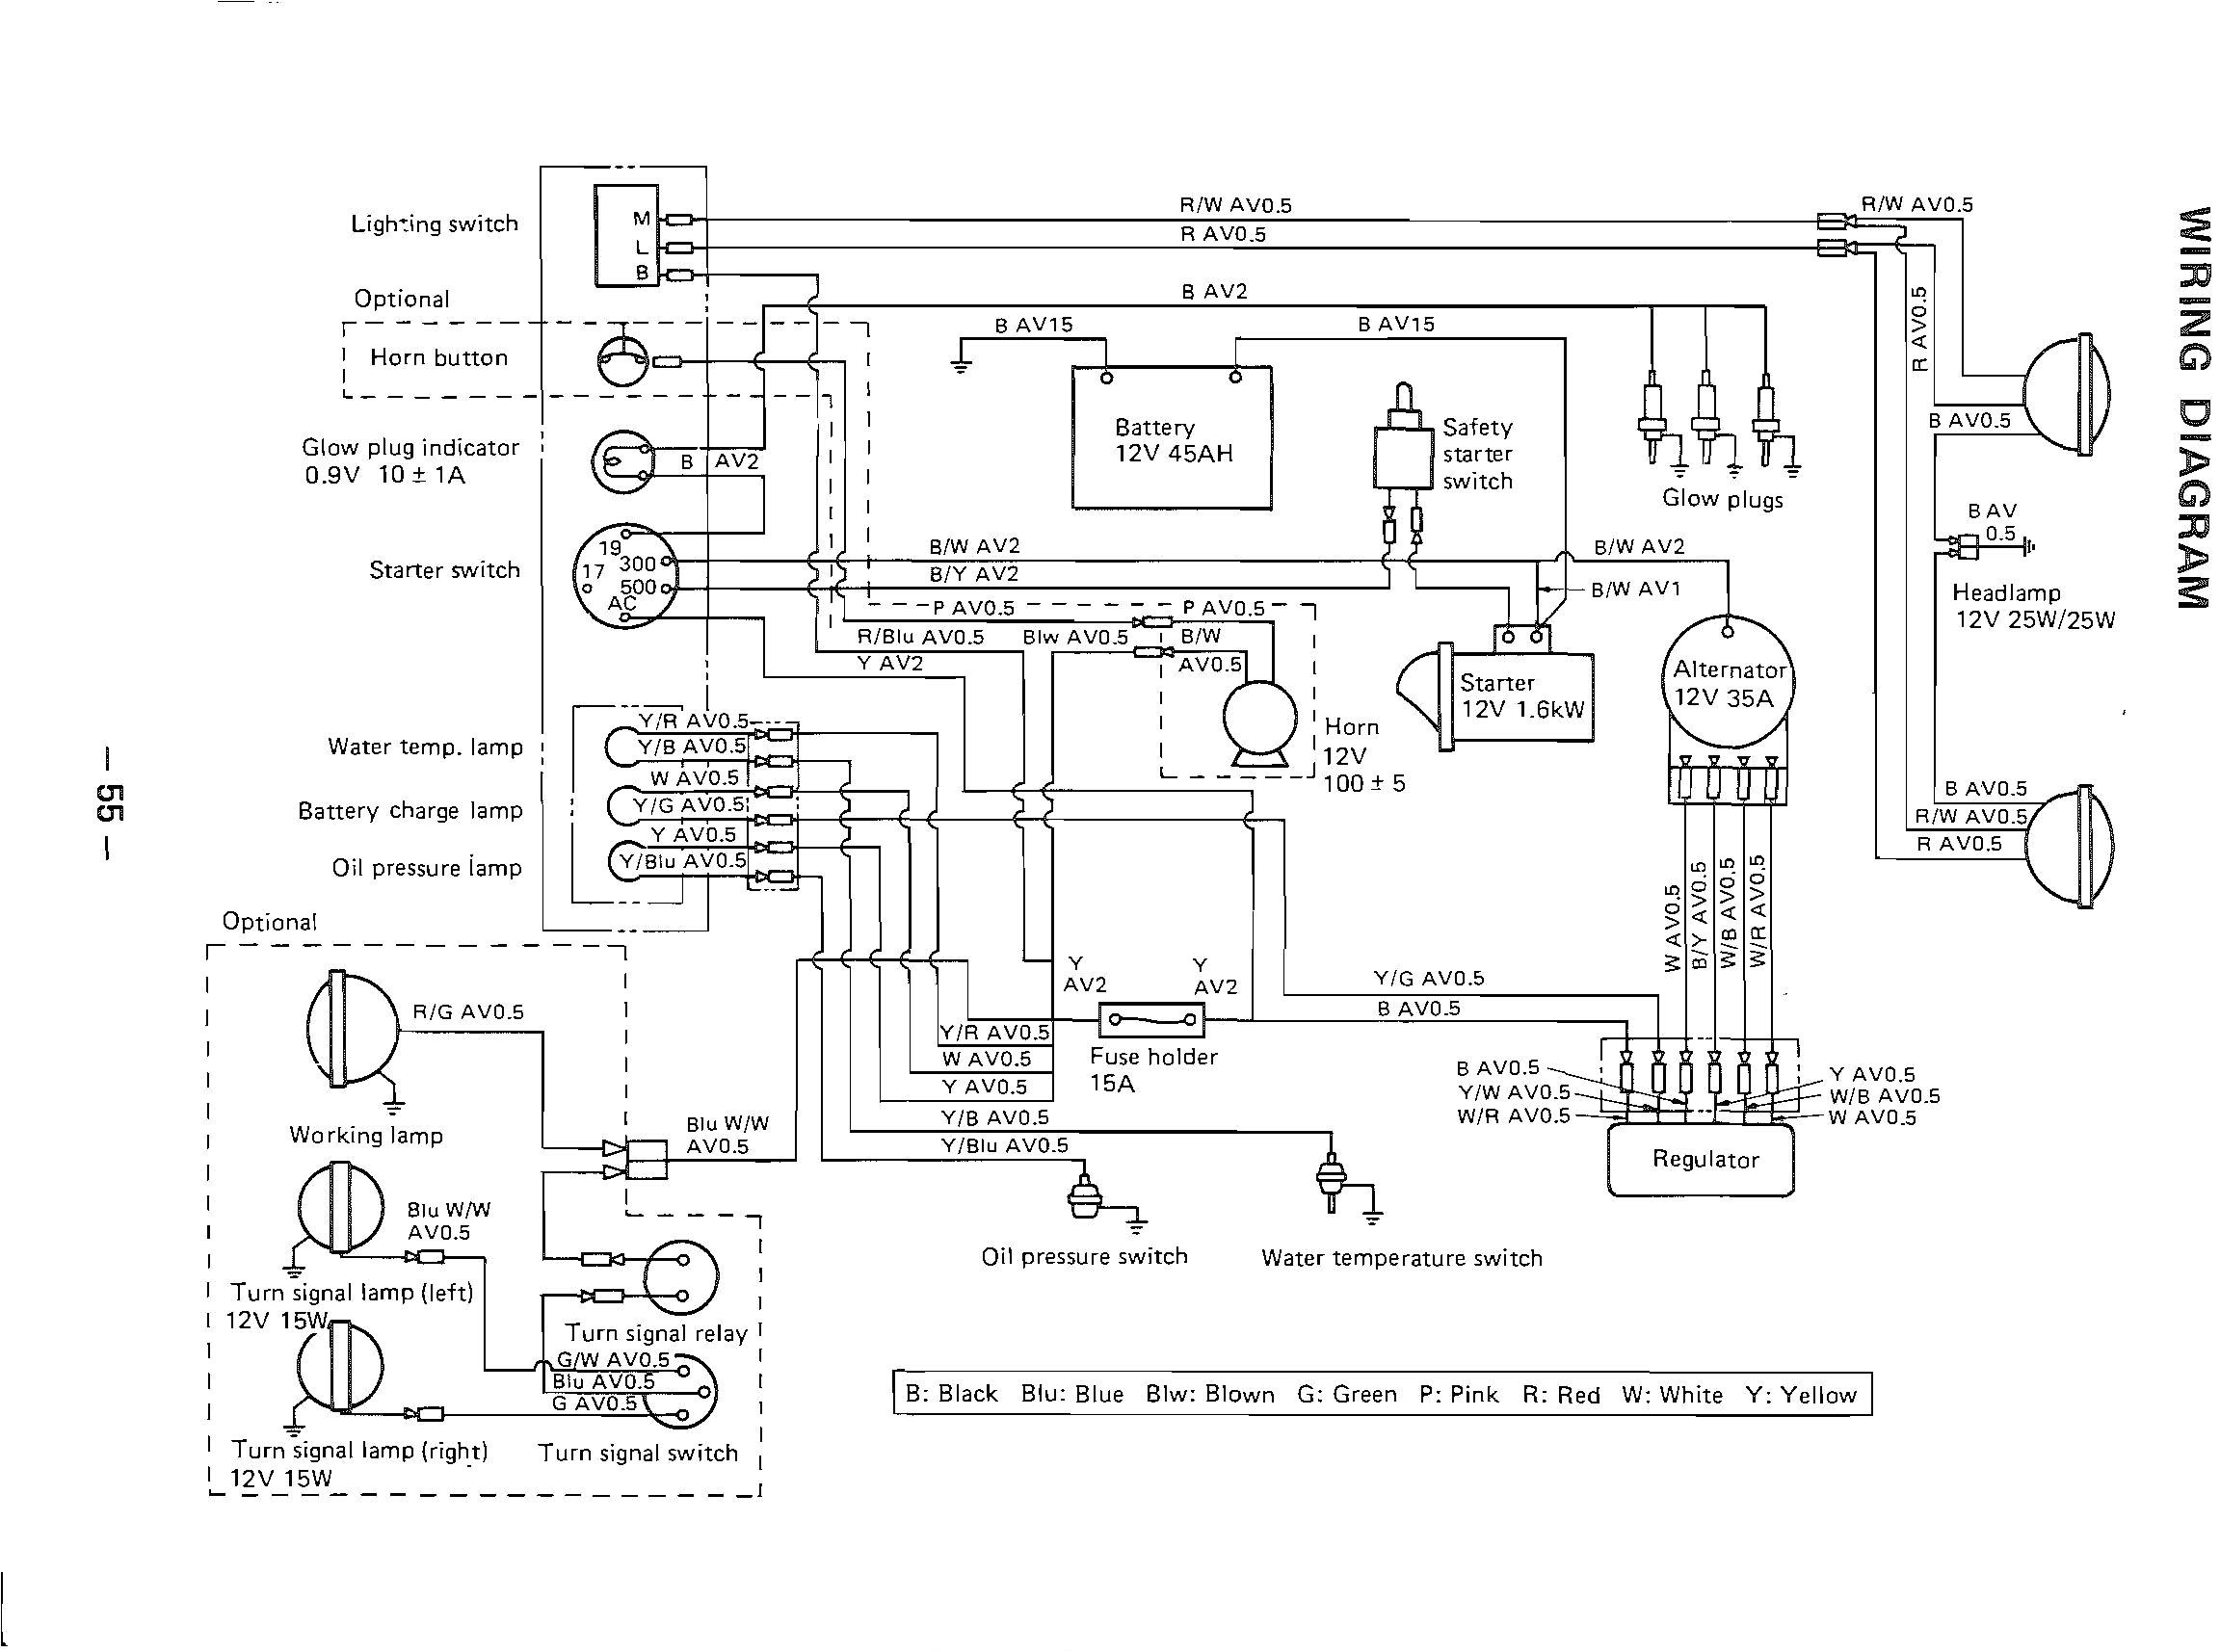 massey ferguson 135 wiring diagram dynamo lovely wiring diagram massey ferguson 573 schematics wiring diagrams